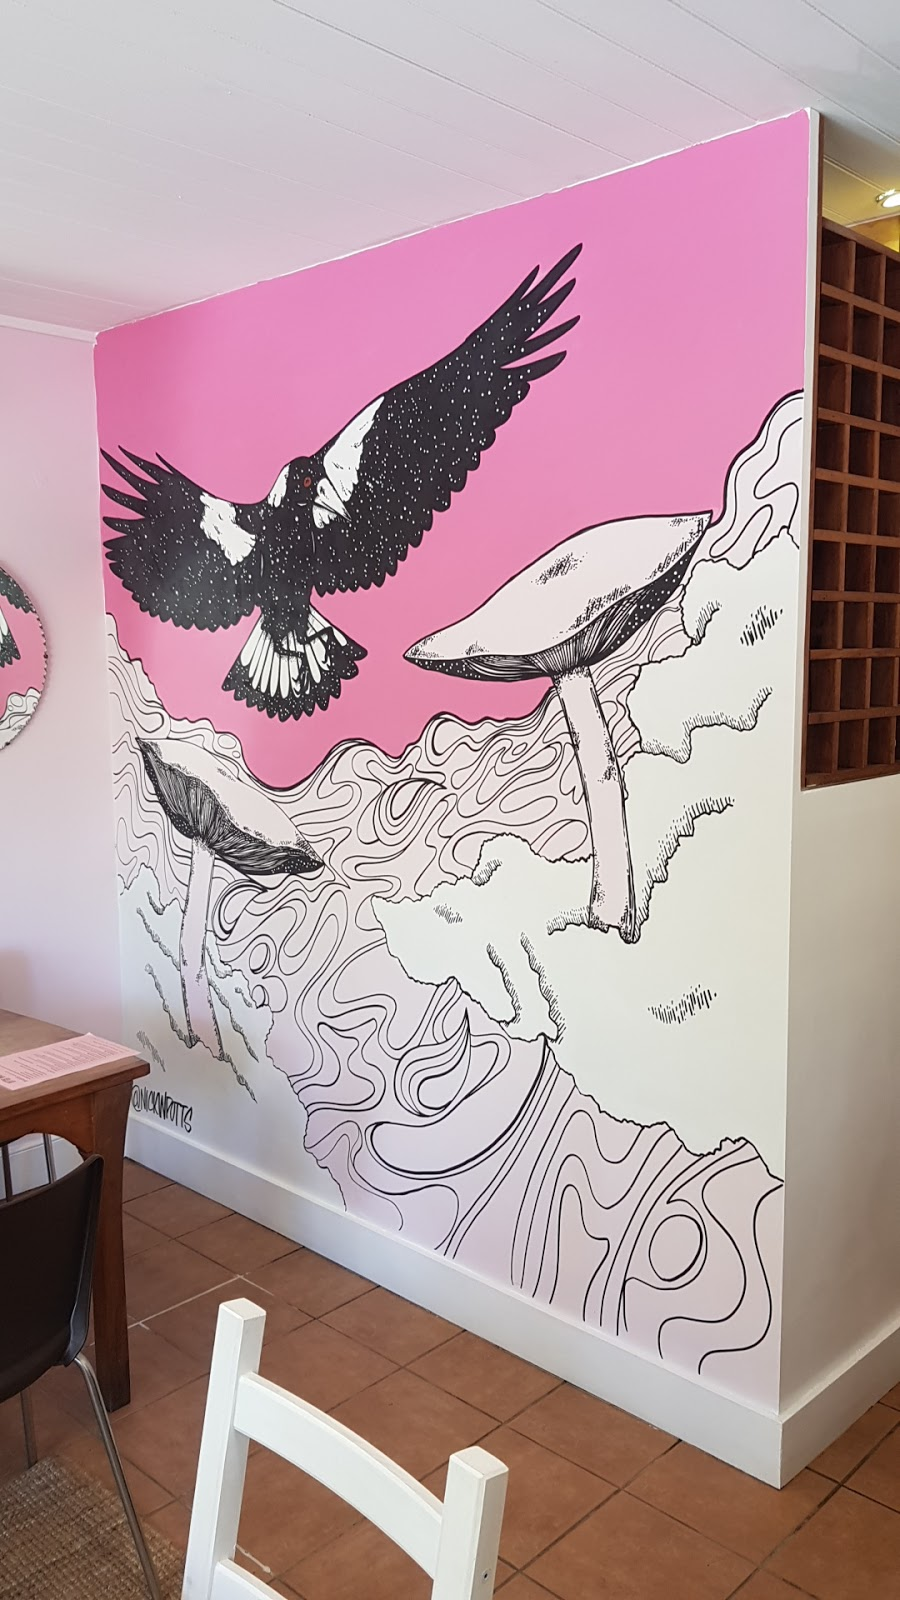 Little Niche Nosh   cafe   Shop 4/201 Leura Mall, Leura NSW 2780, Australia   0414134473 OR +61 414 134 473